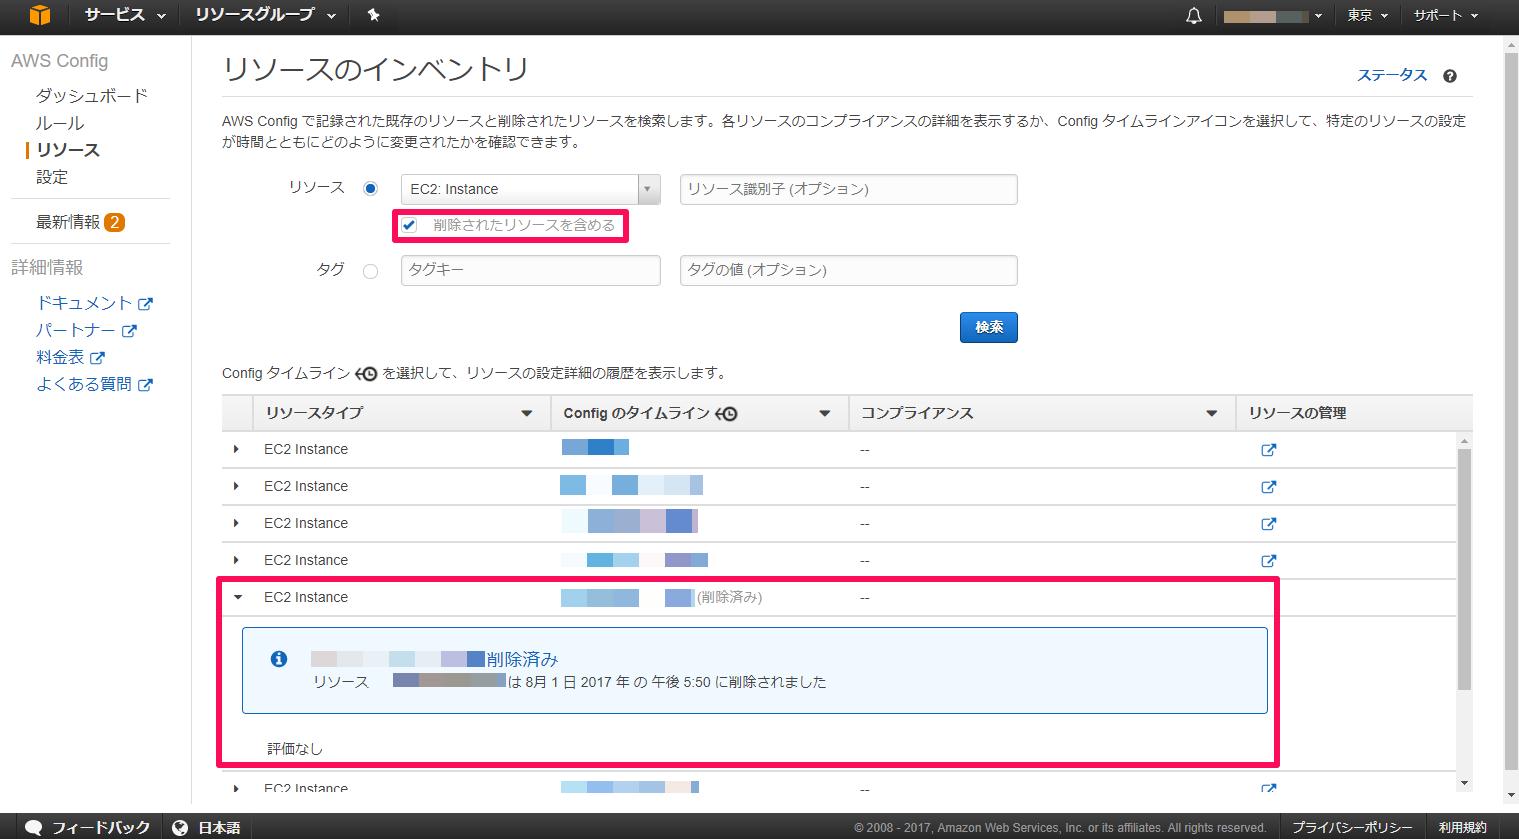 AWS Config初回設定編 | ナレコムAWSレシピ